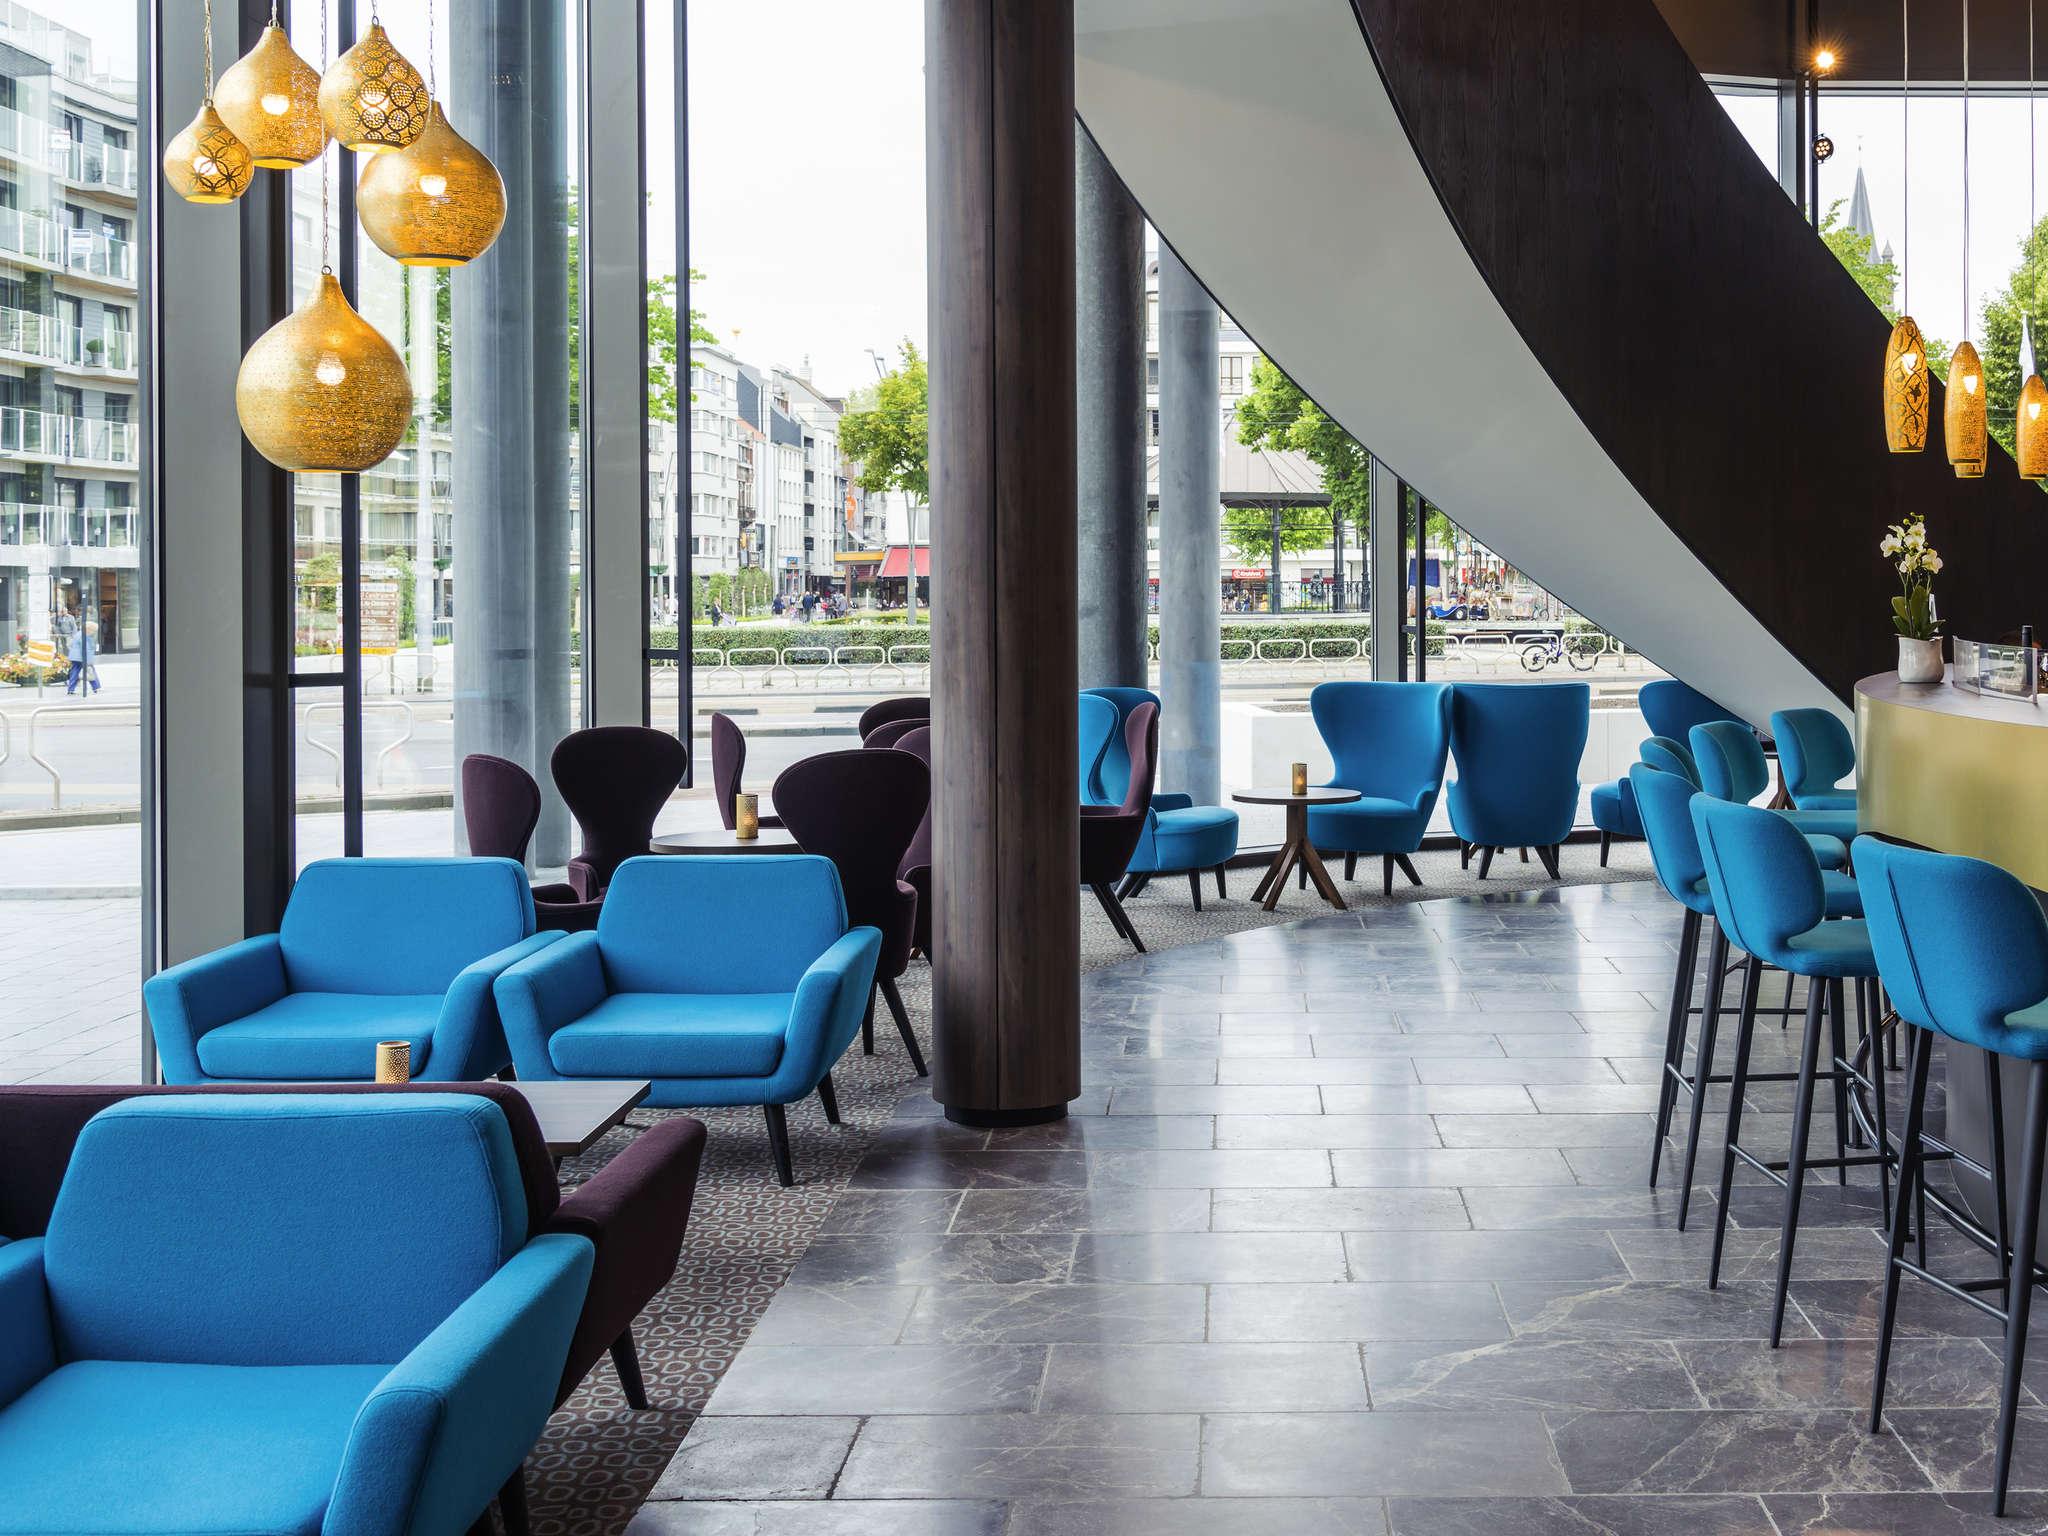 Hotel – Hotel Mercure Blankenberge Station